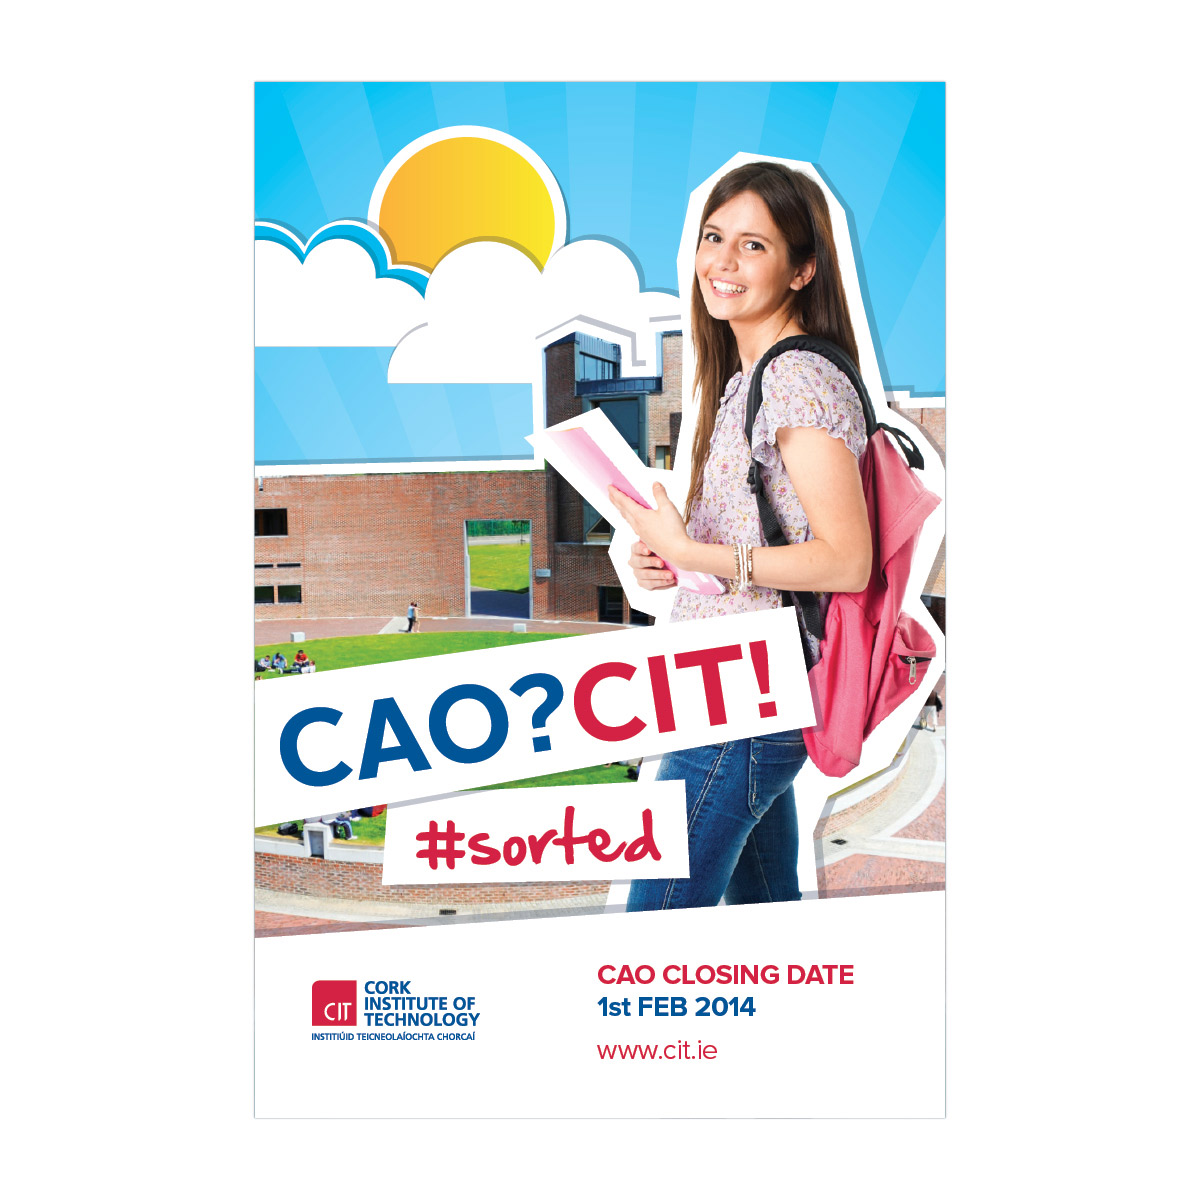 CIT_CAO_campaign-2014_02.jpg